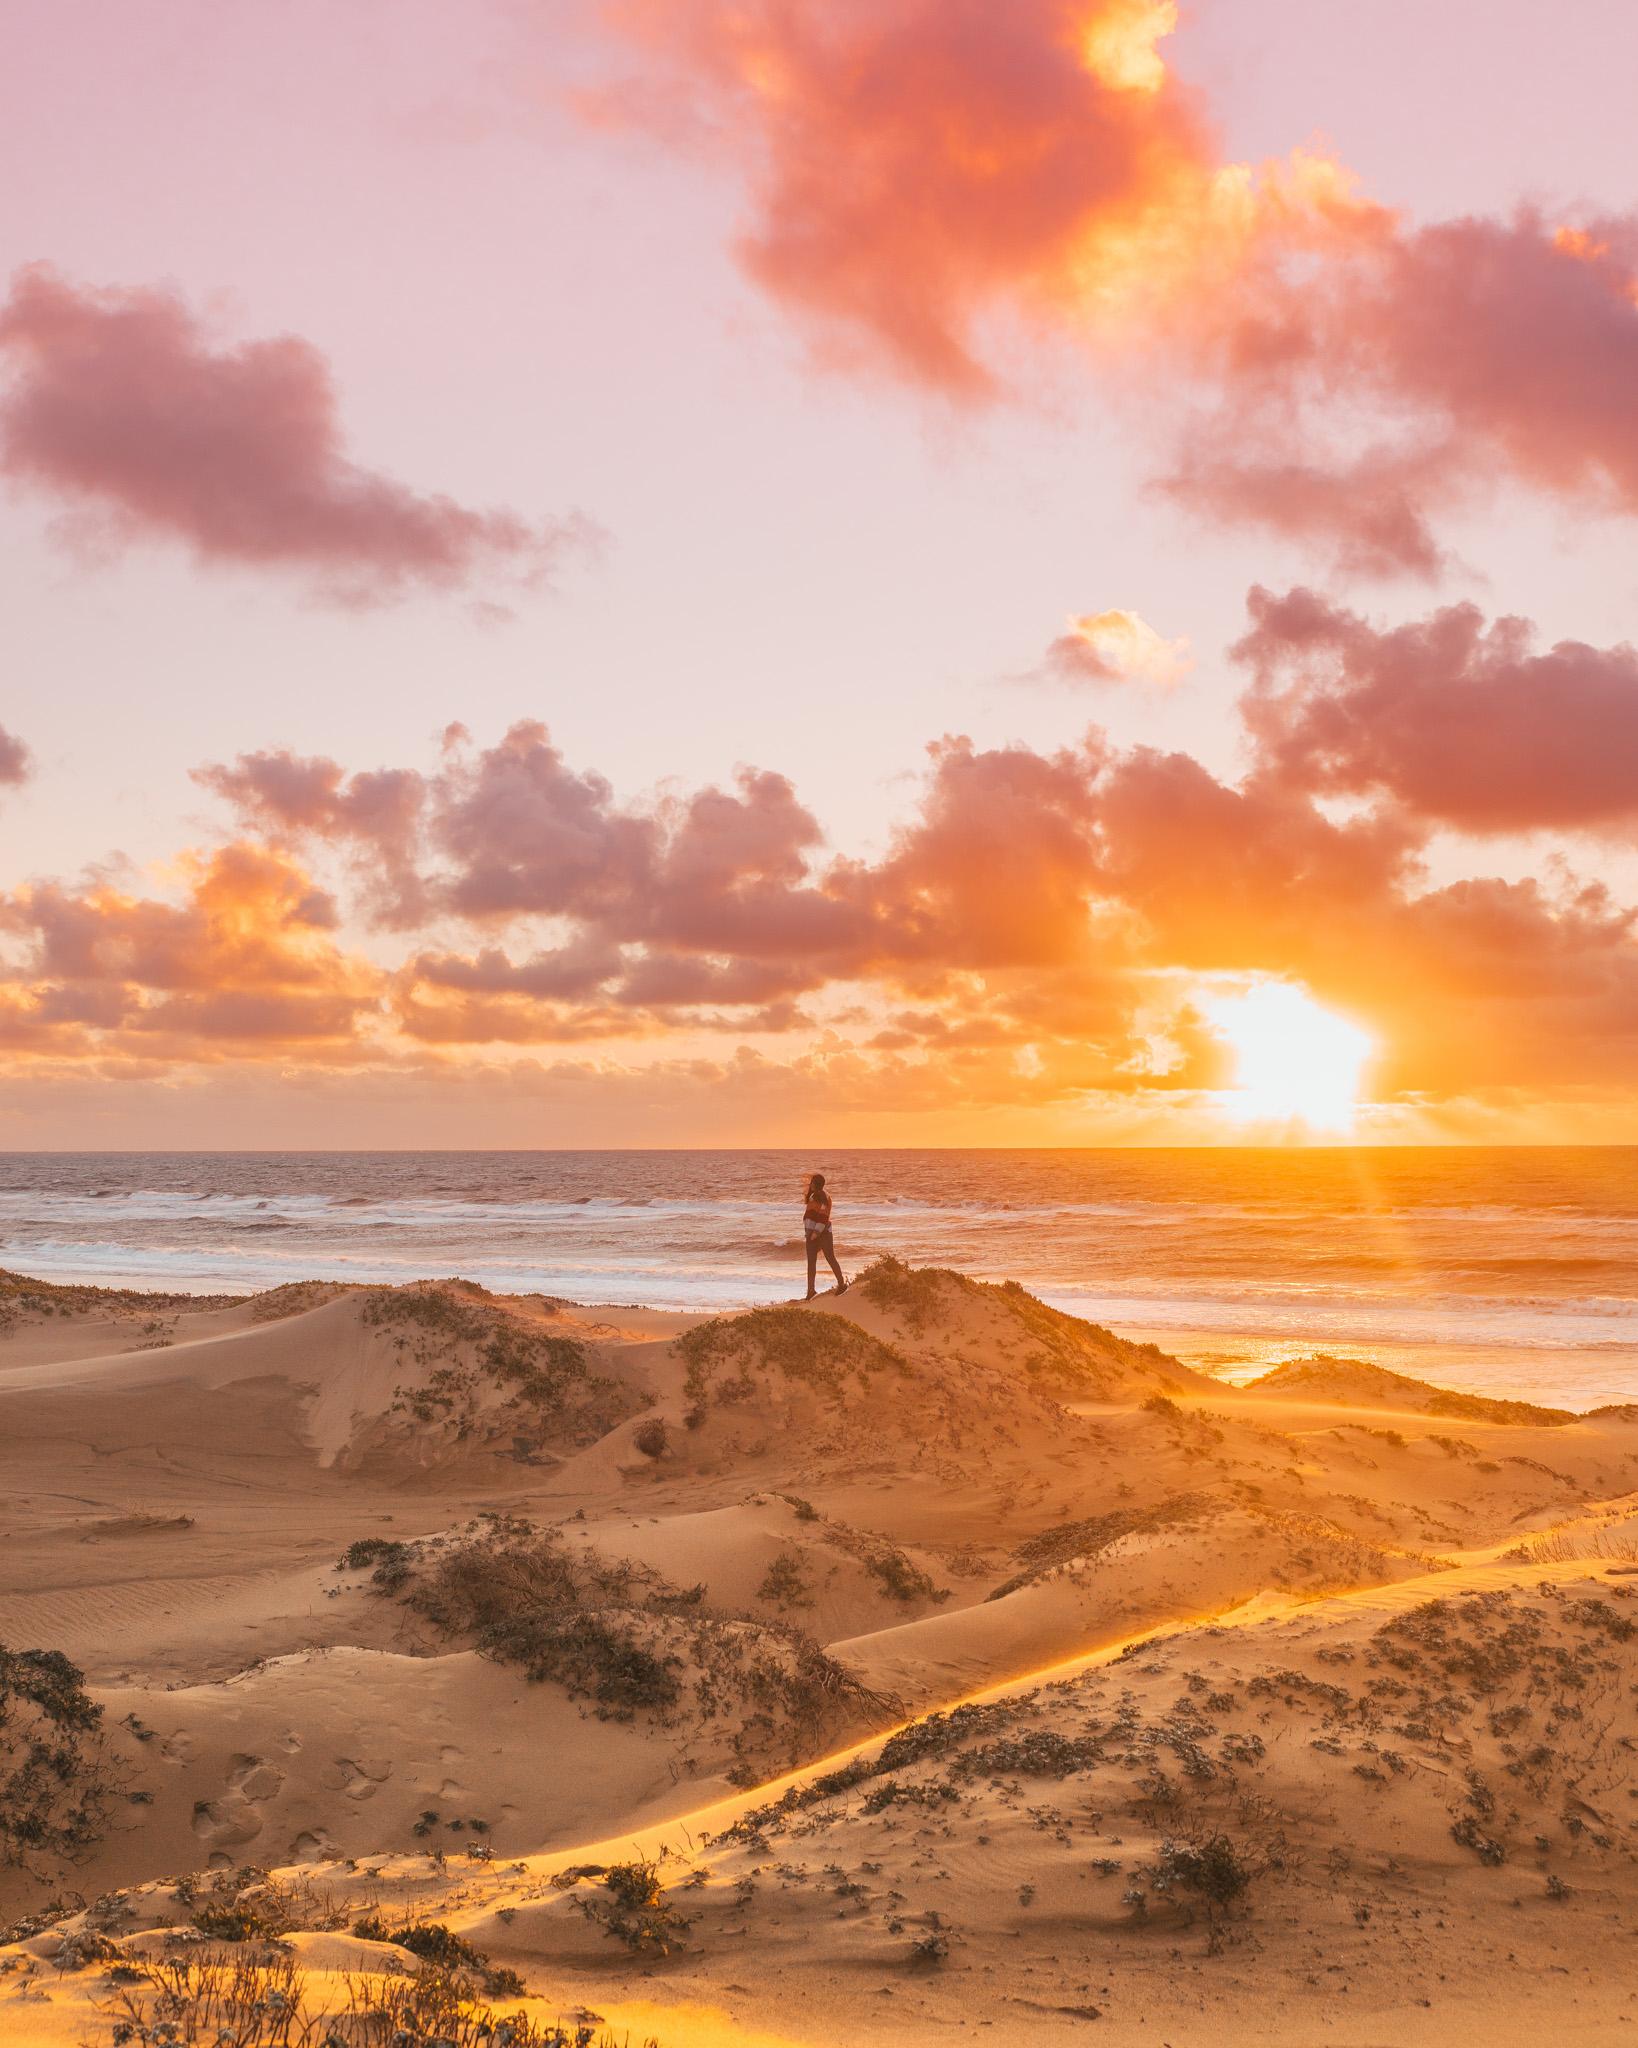 Oceano Dunes ~ The Most Instagrammable Spots in SLO CAL County ~ #readysetjetset #slocal #california #blogpost #travel #sanluisobispo